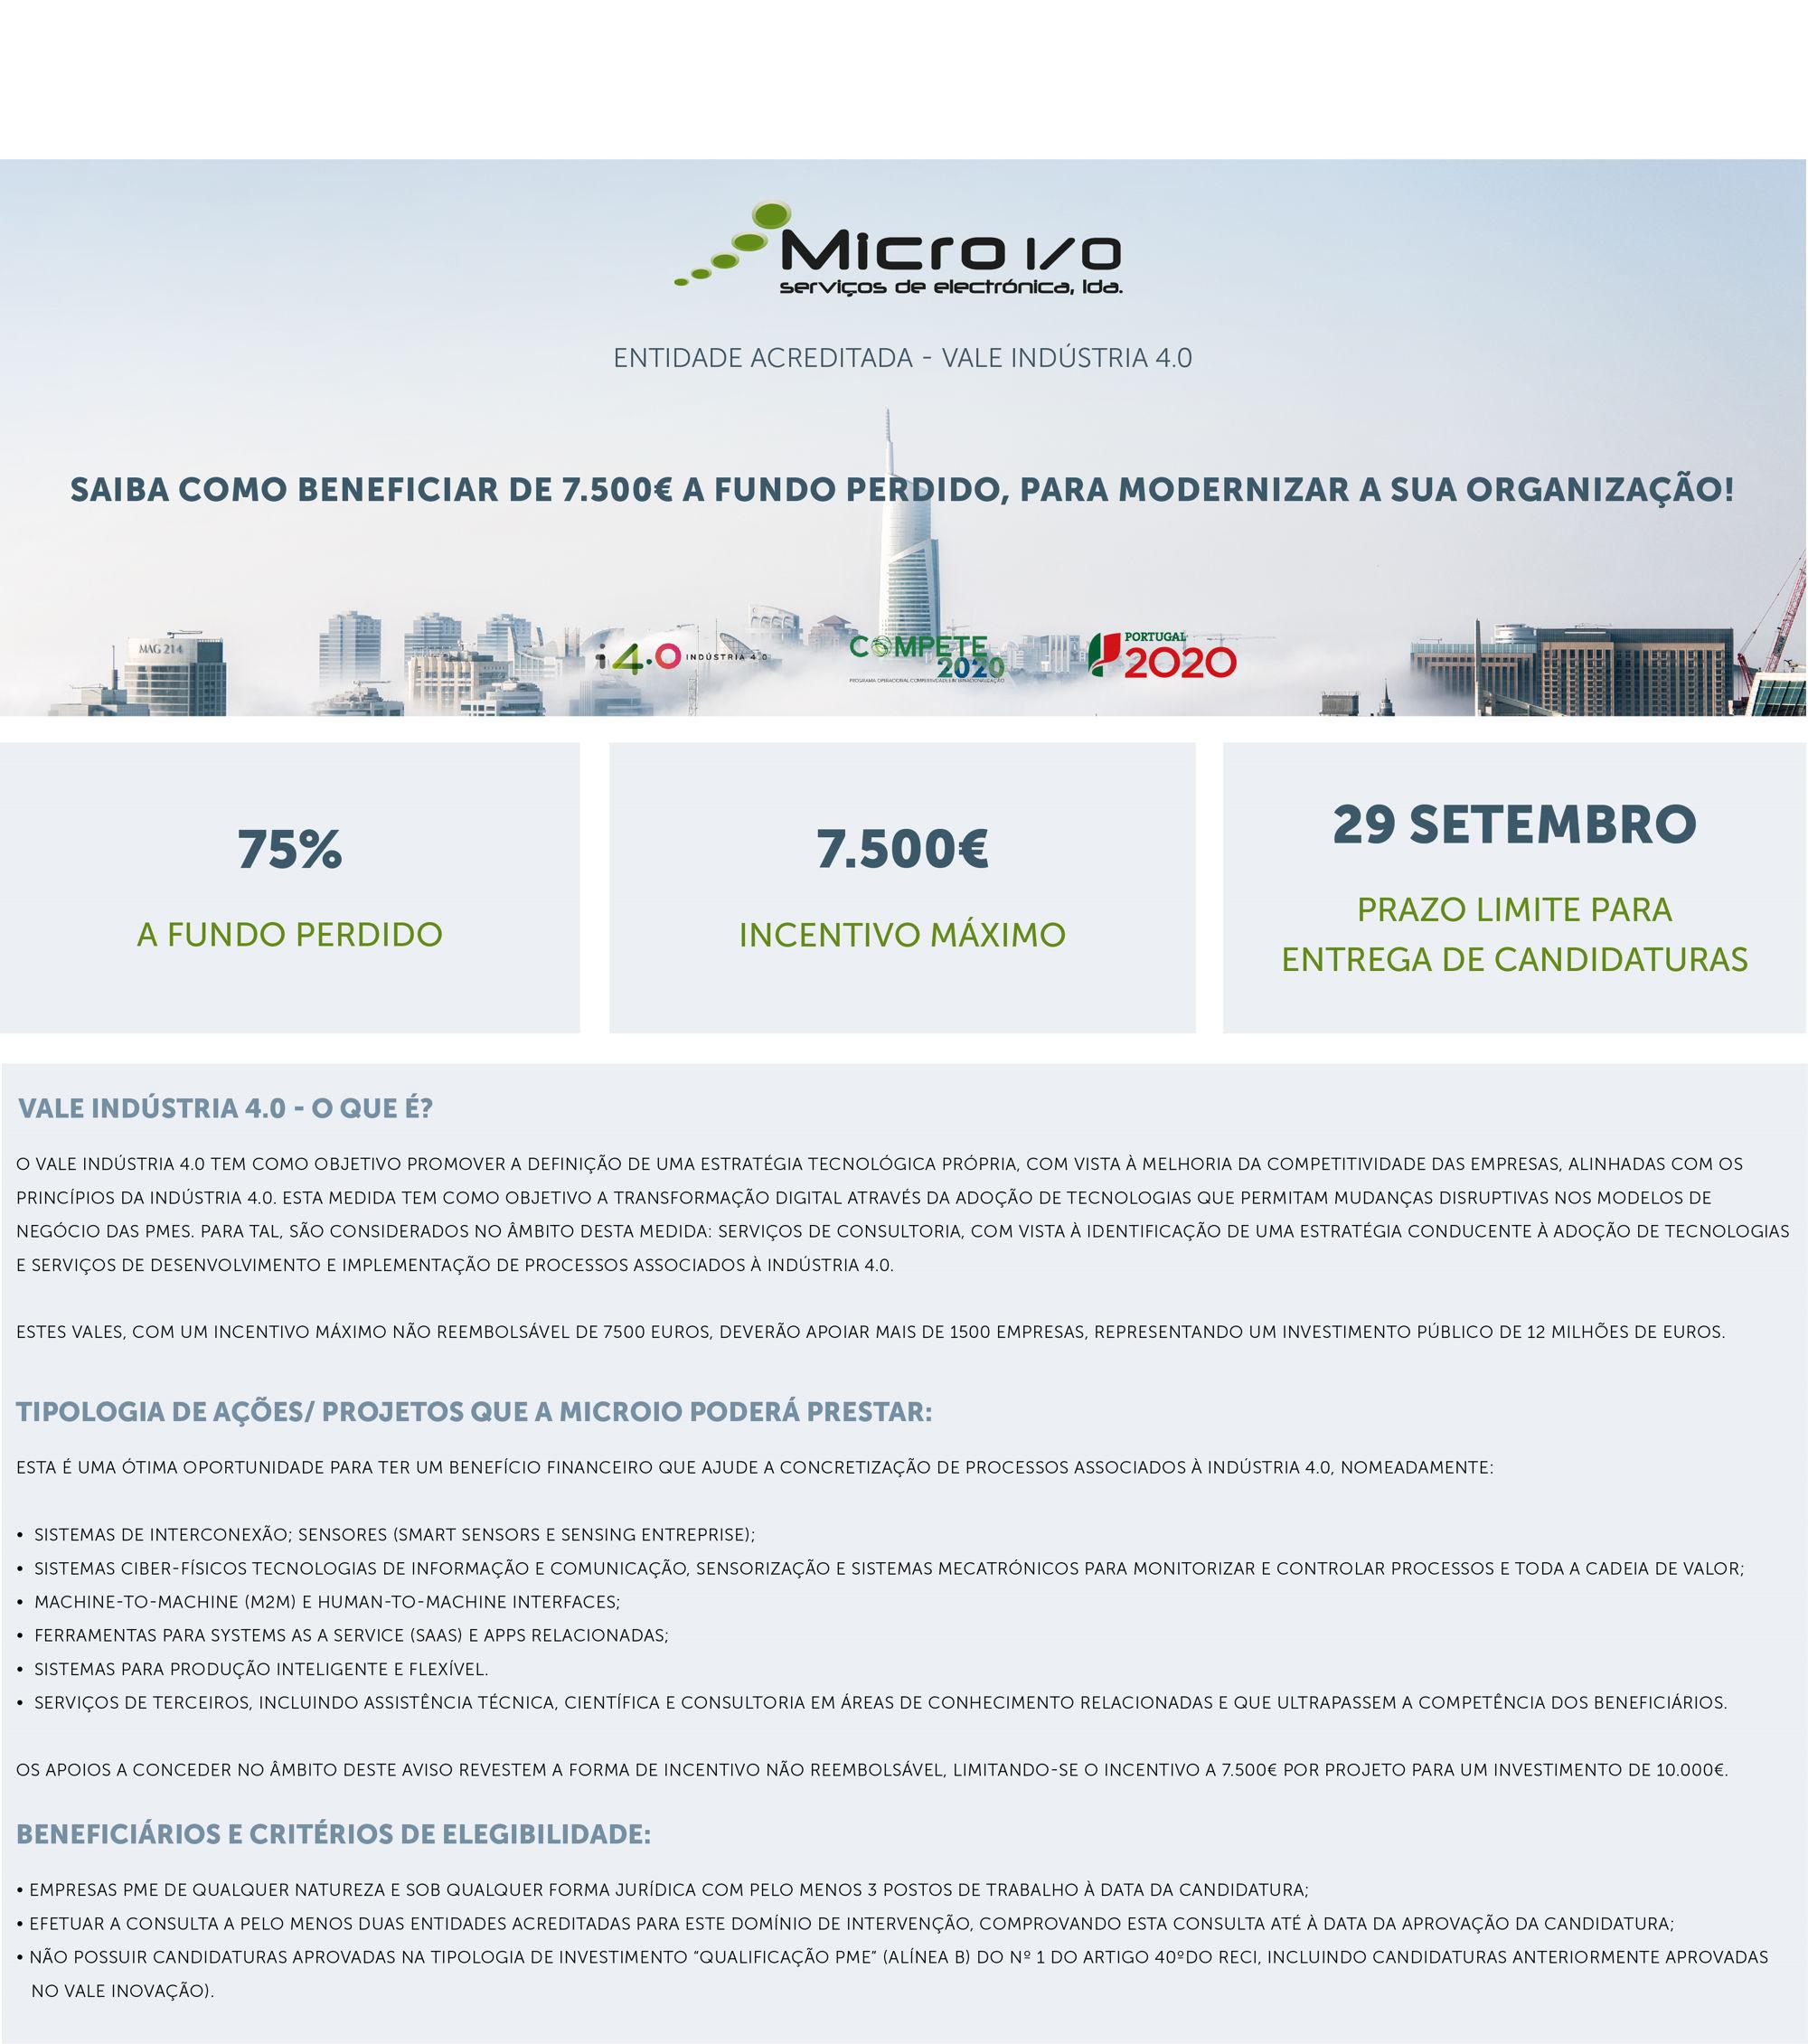 VALE INDUSTRIA 4.0. 7500€ a fundo perdido